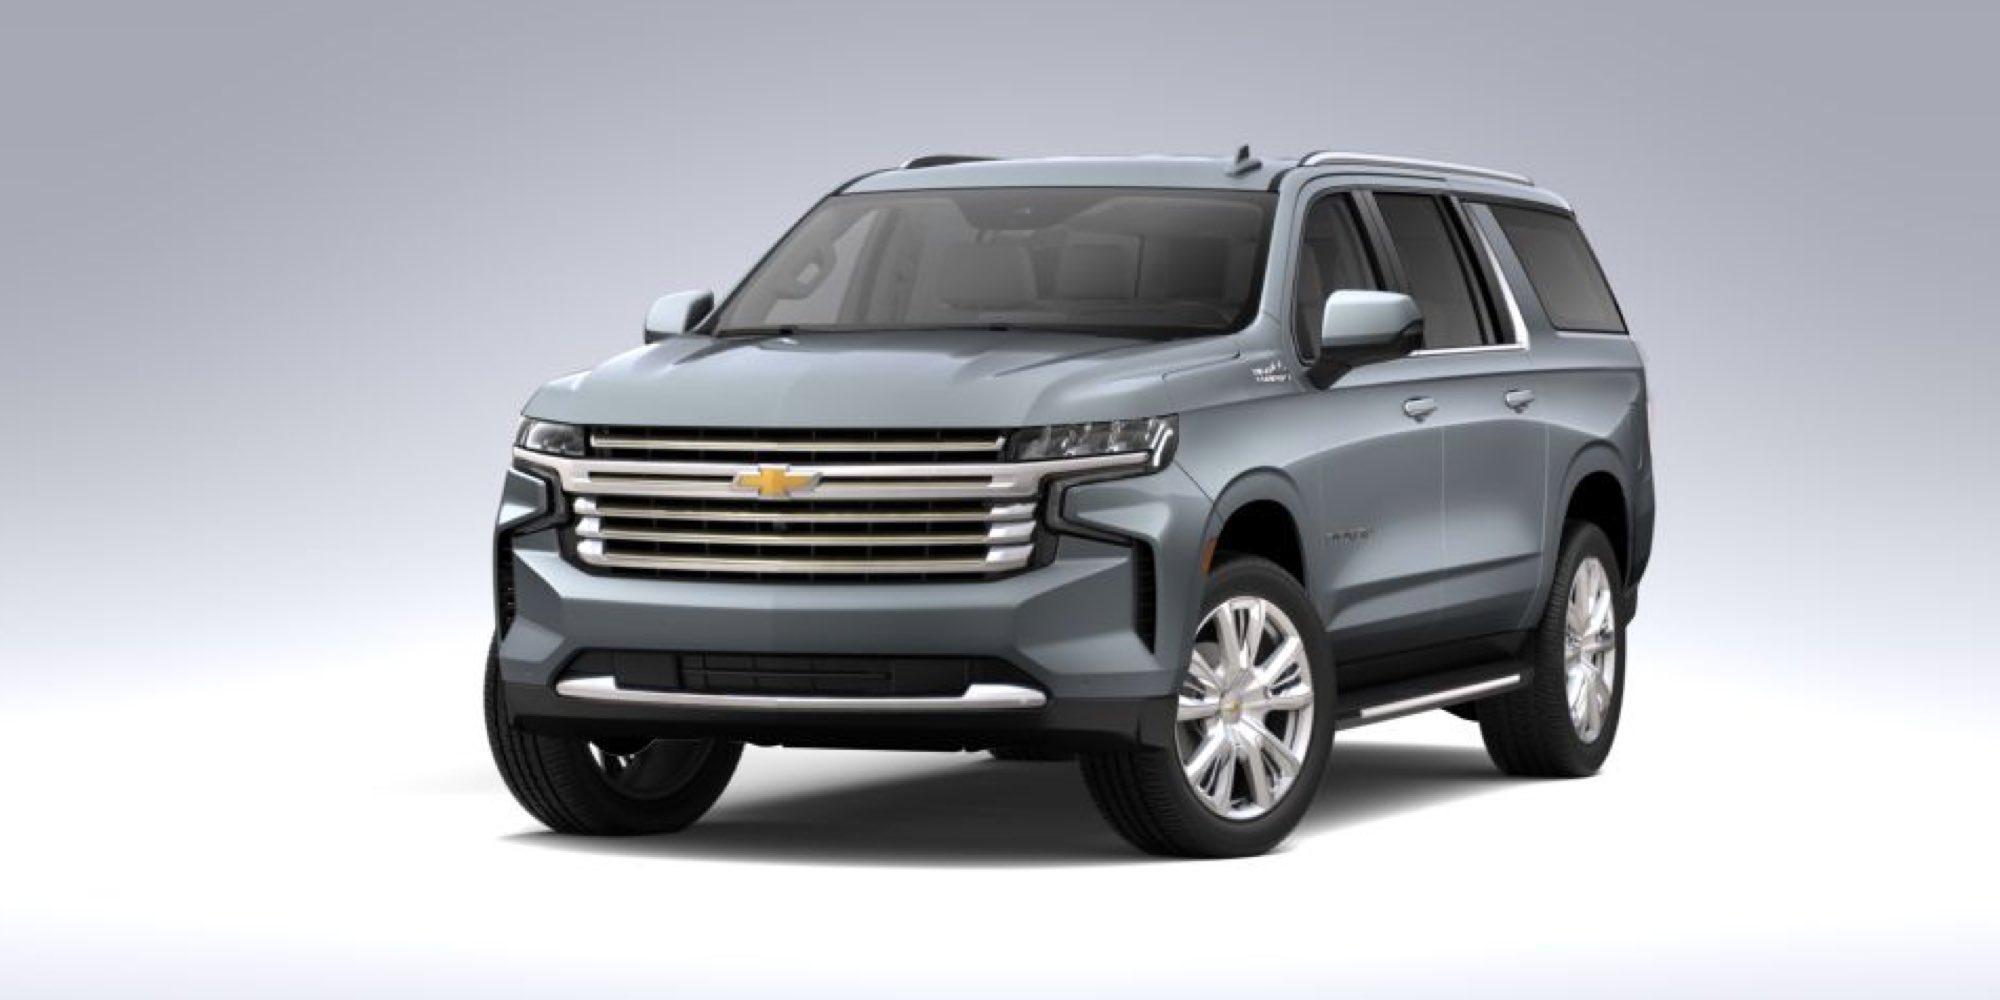 2021 Chevrolet Suburban in Satin Steel Metallic